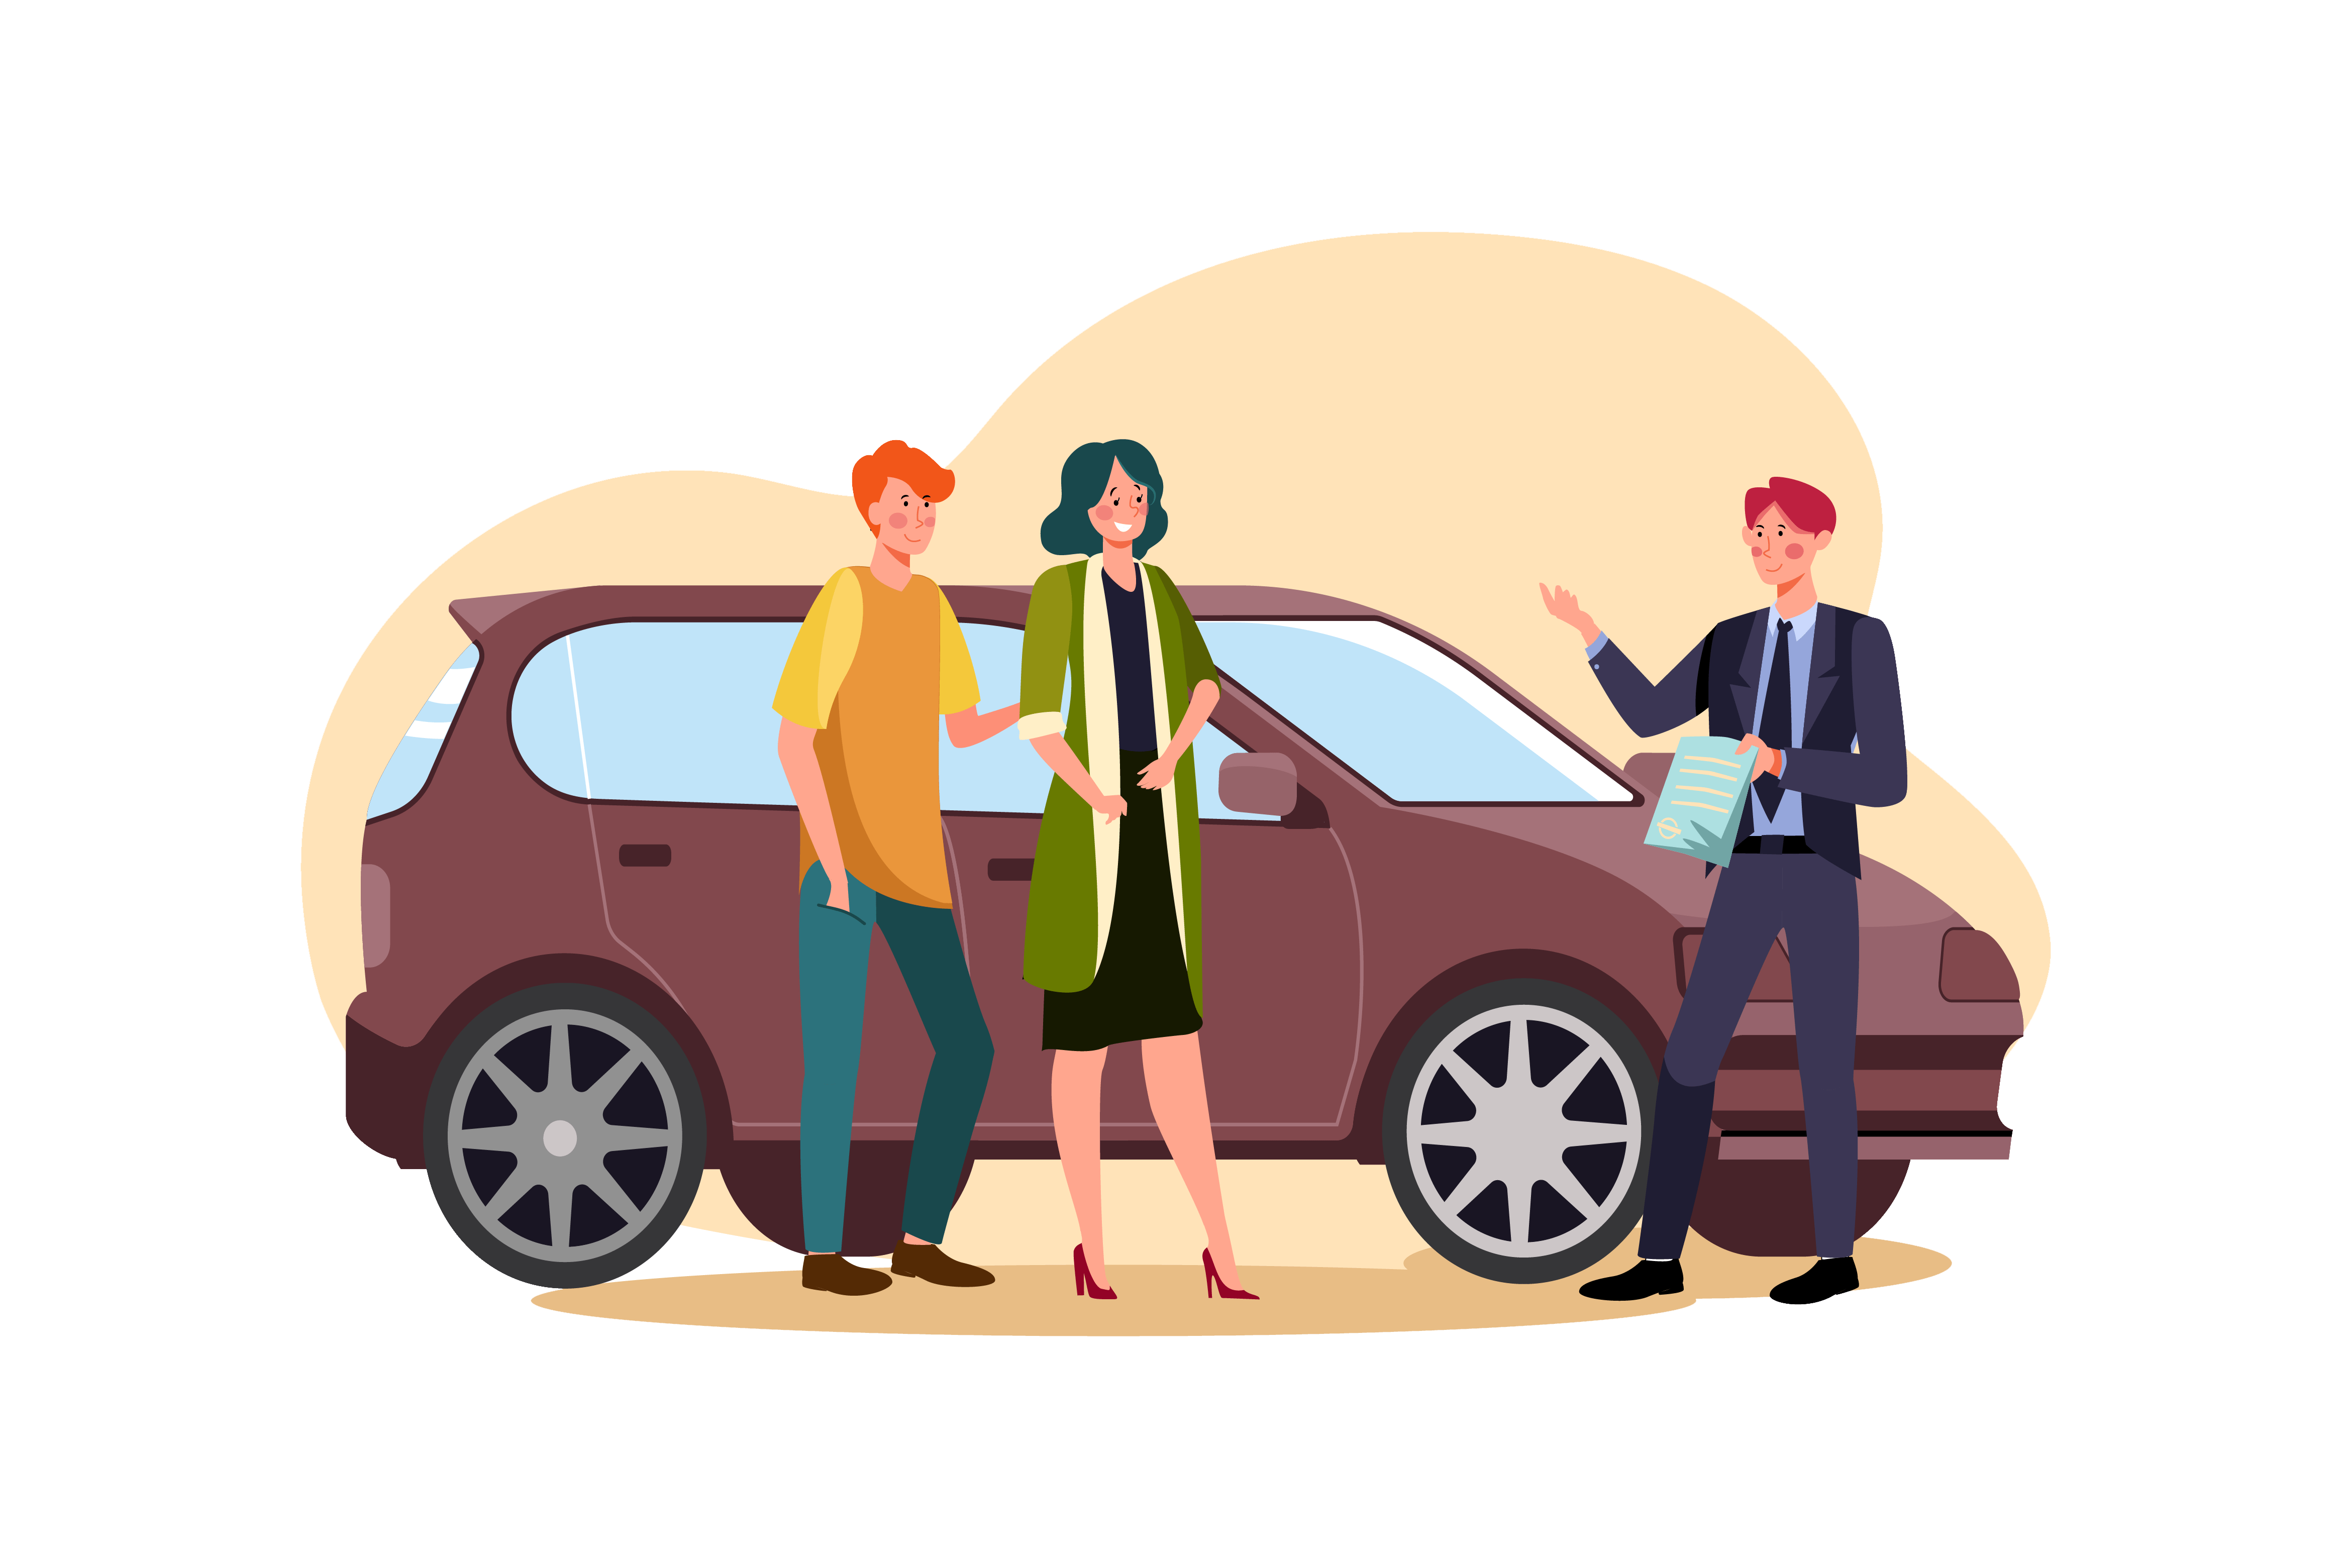 vente d'un vehicule